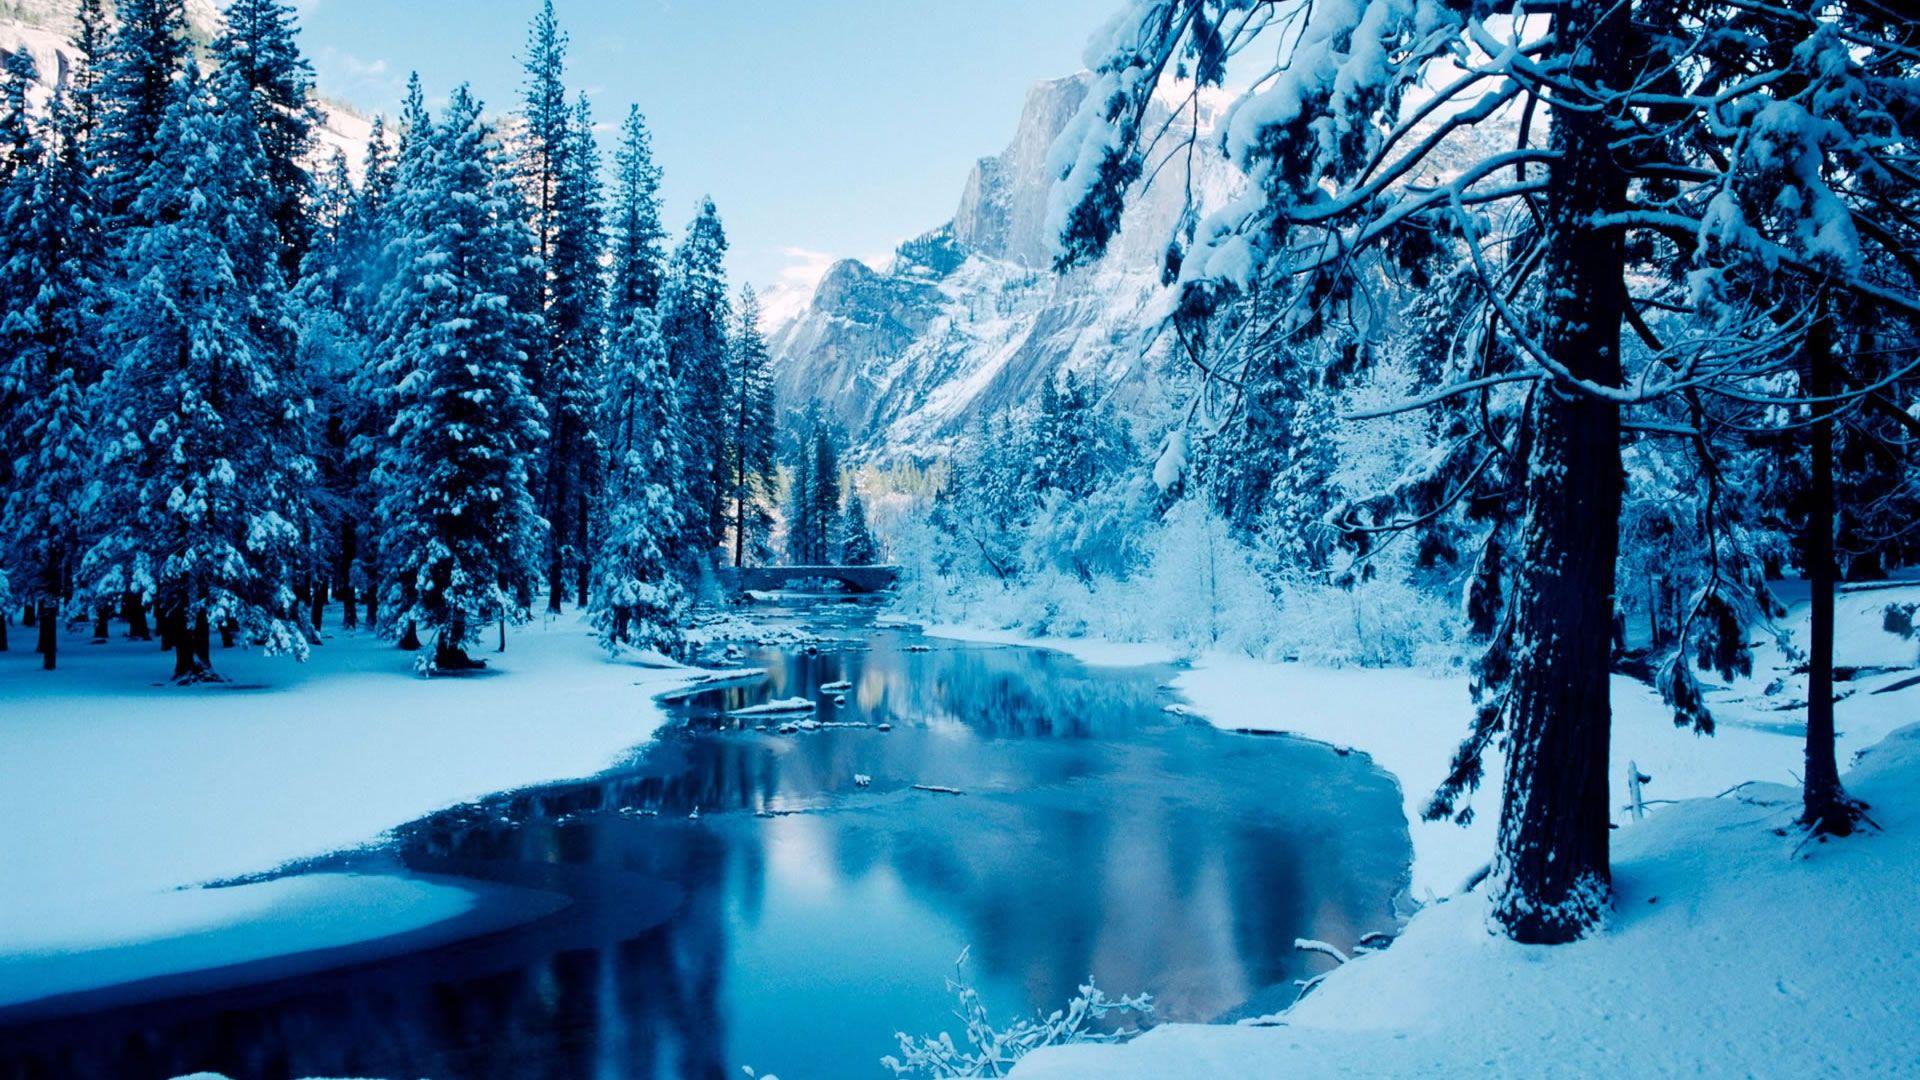 Blue Winter Winter Wallpaper Hd Winter Background Winter Nature